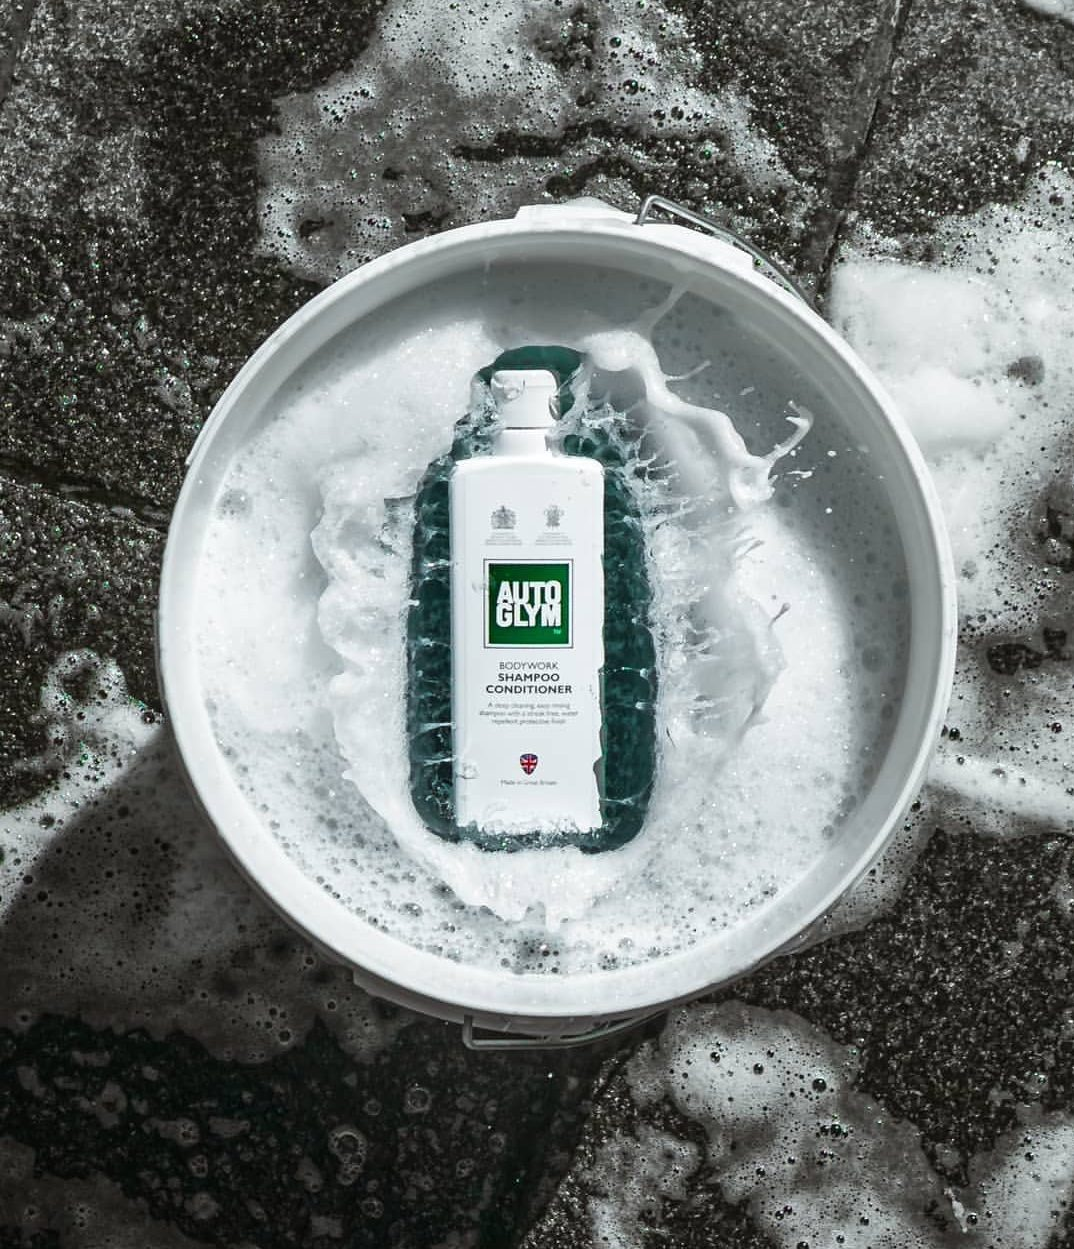 autoglym sk cistiaci sampon odpudivy Bodywork Shampoo Conditioner_photo